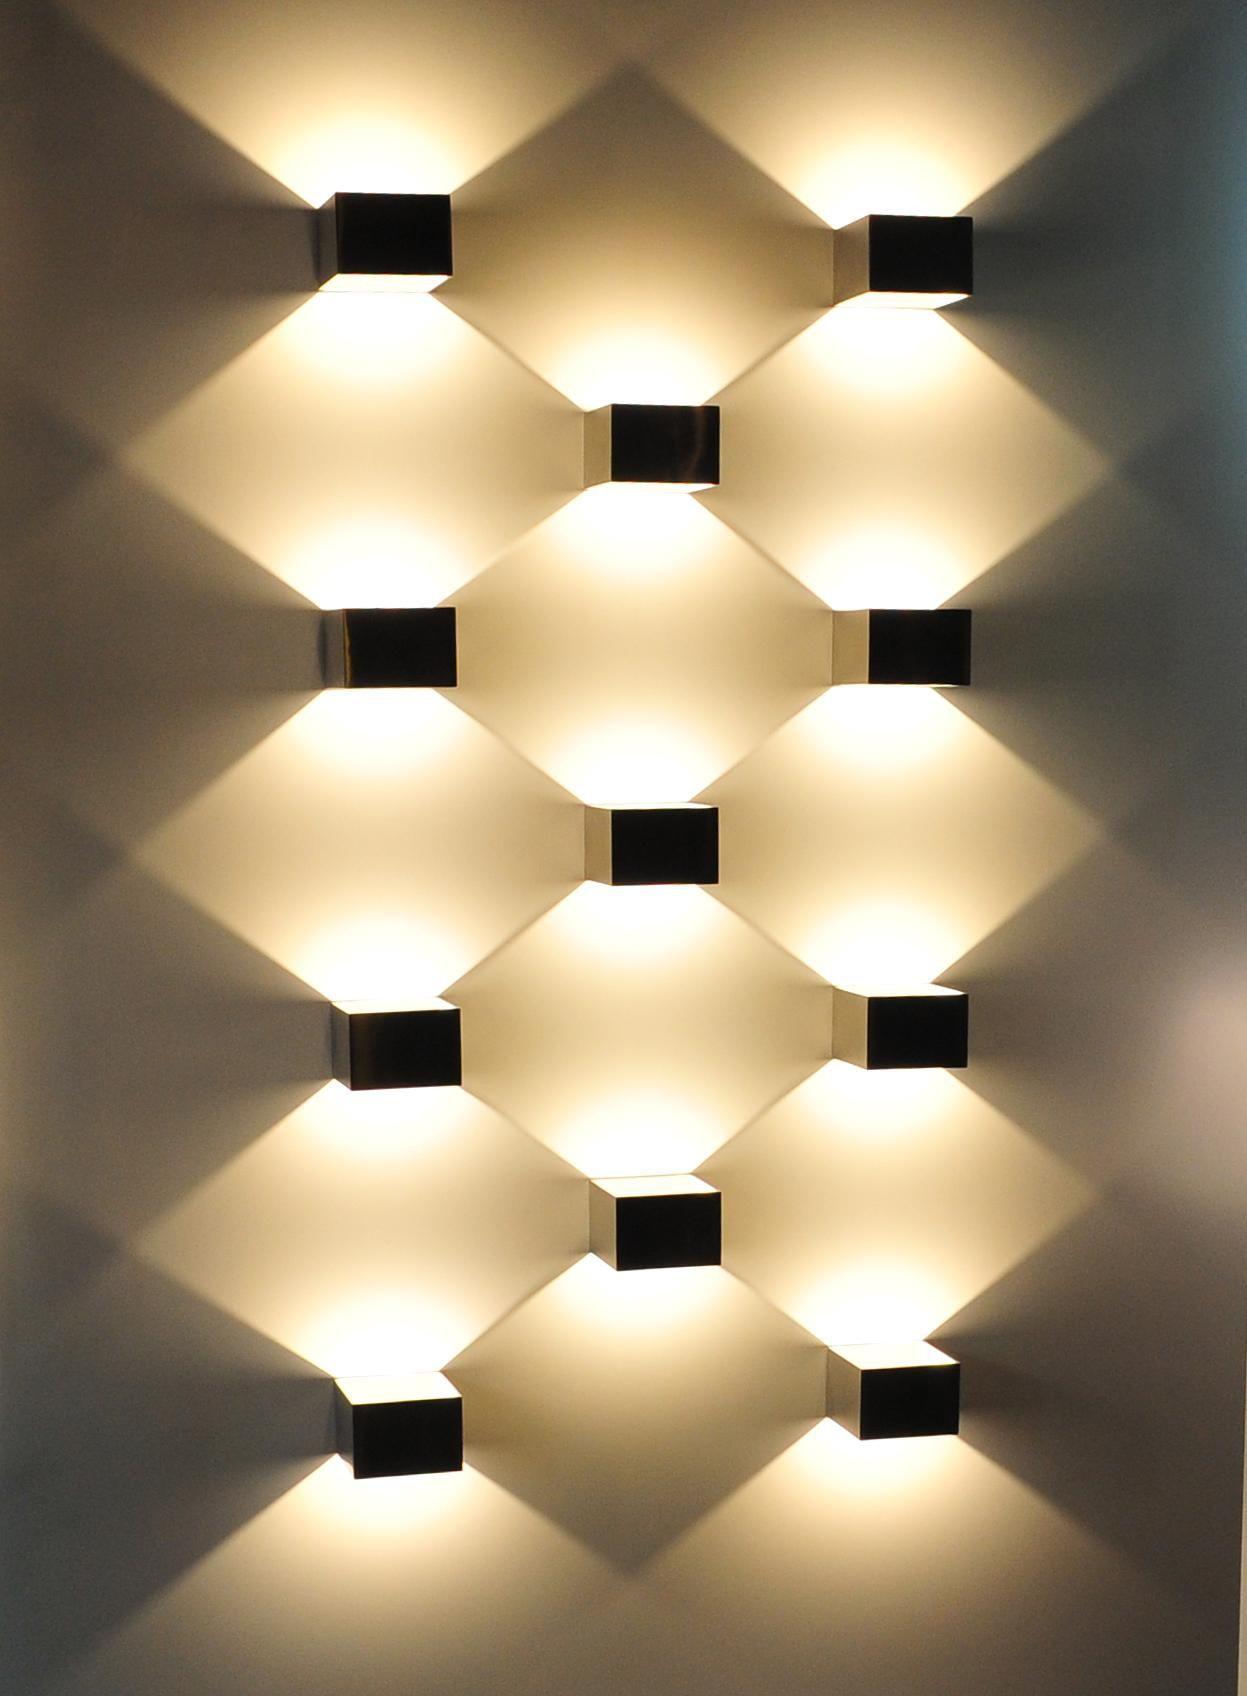 LOGS IN by SLV BY DECLIC #Lights | hoş | Pinterest | Logs, Lights ...